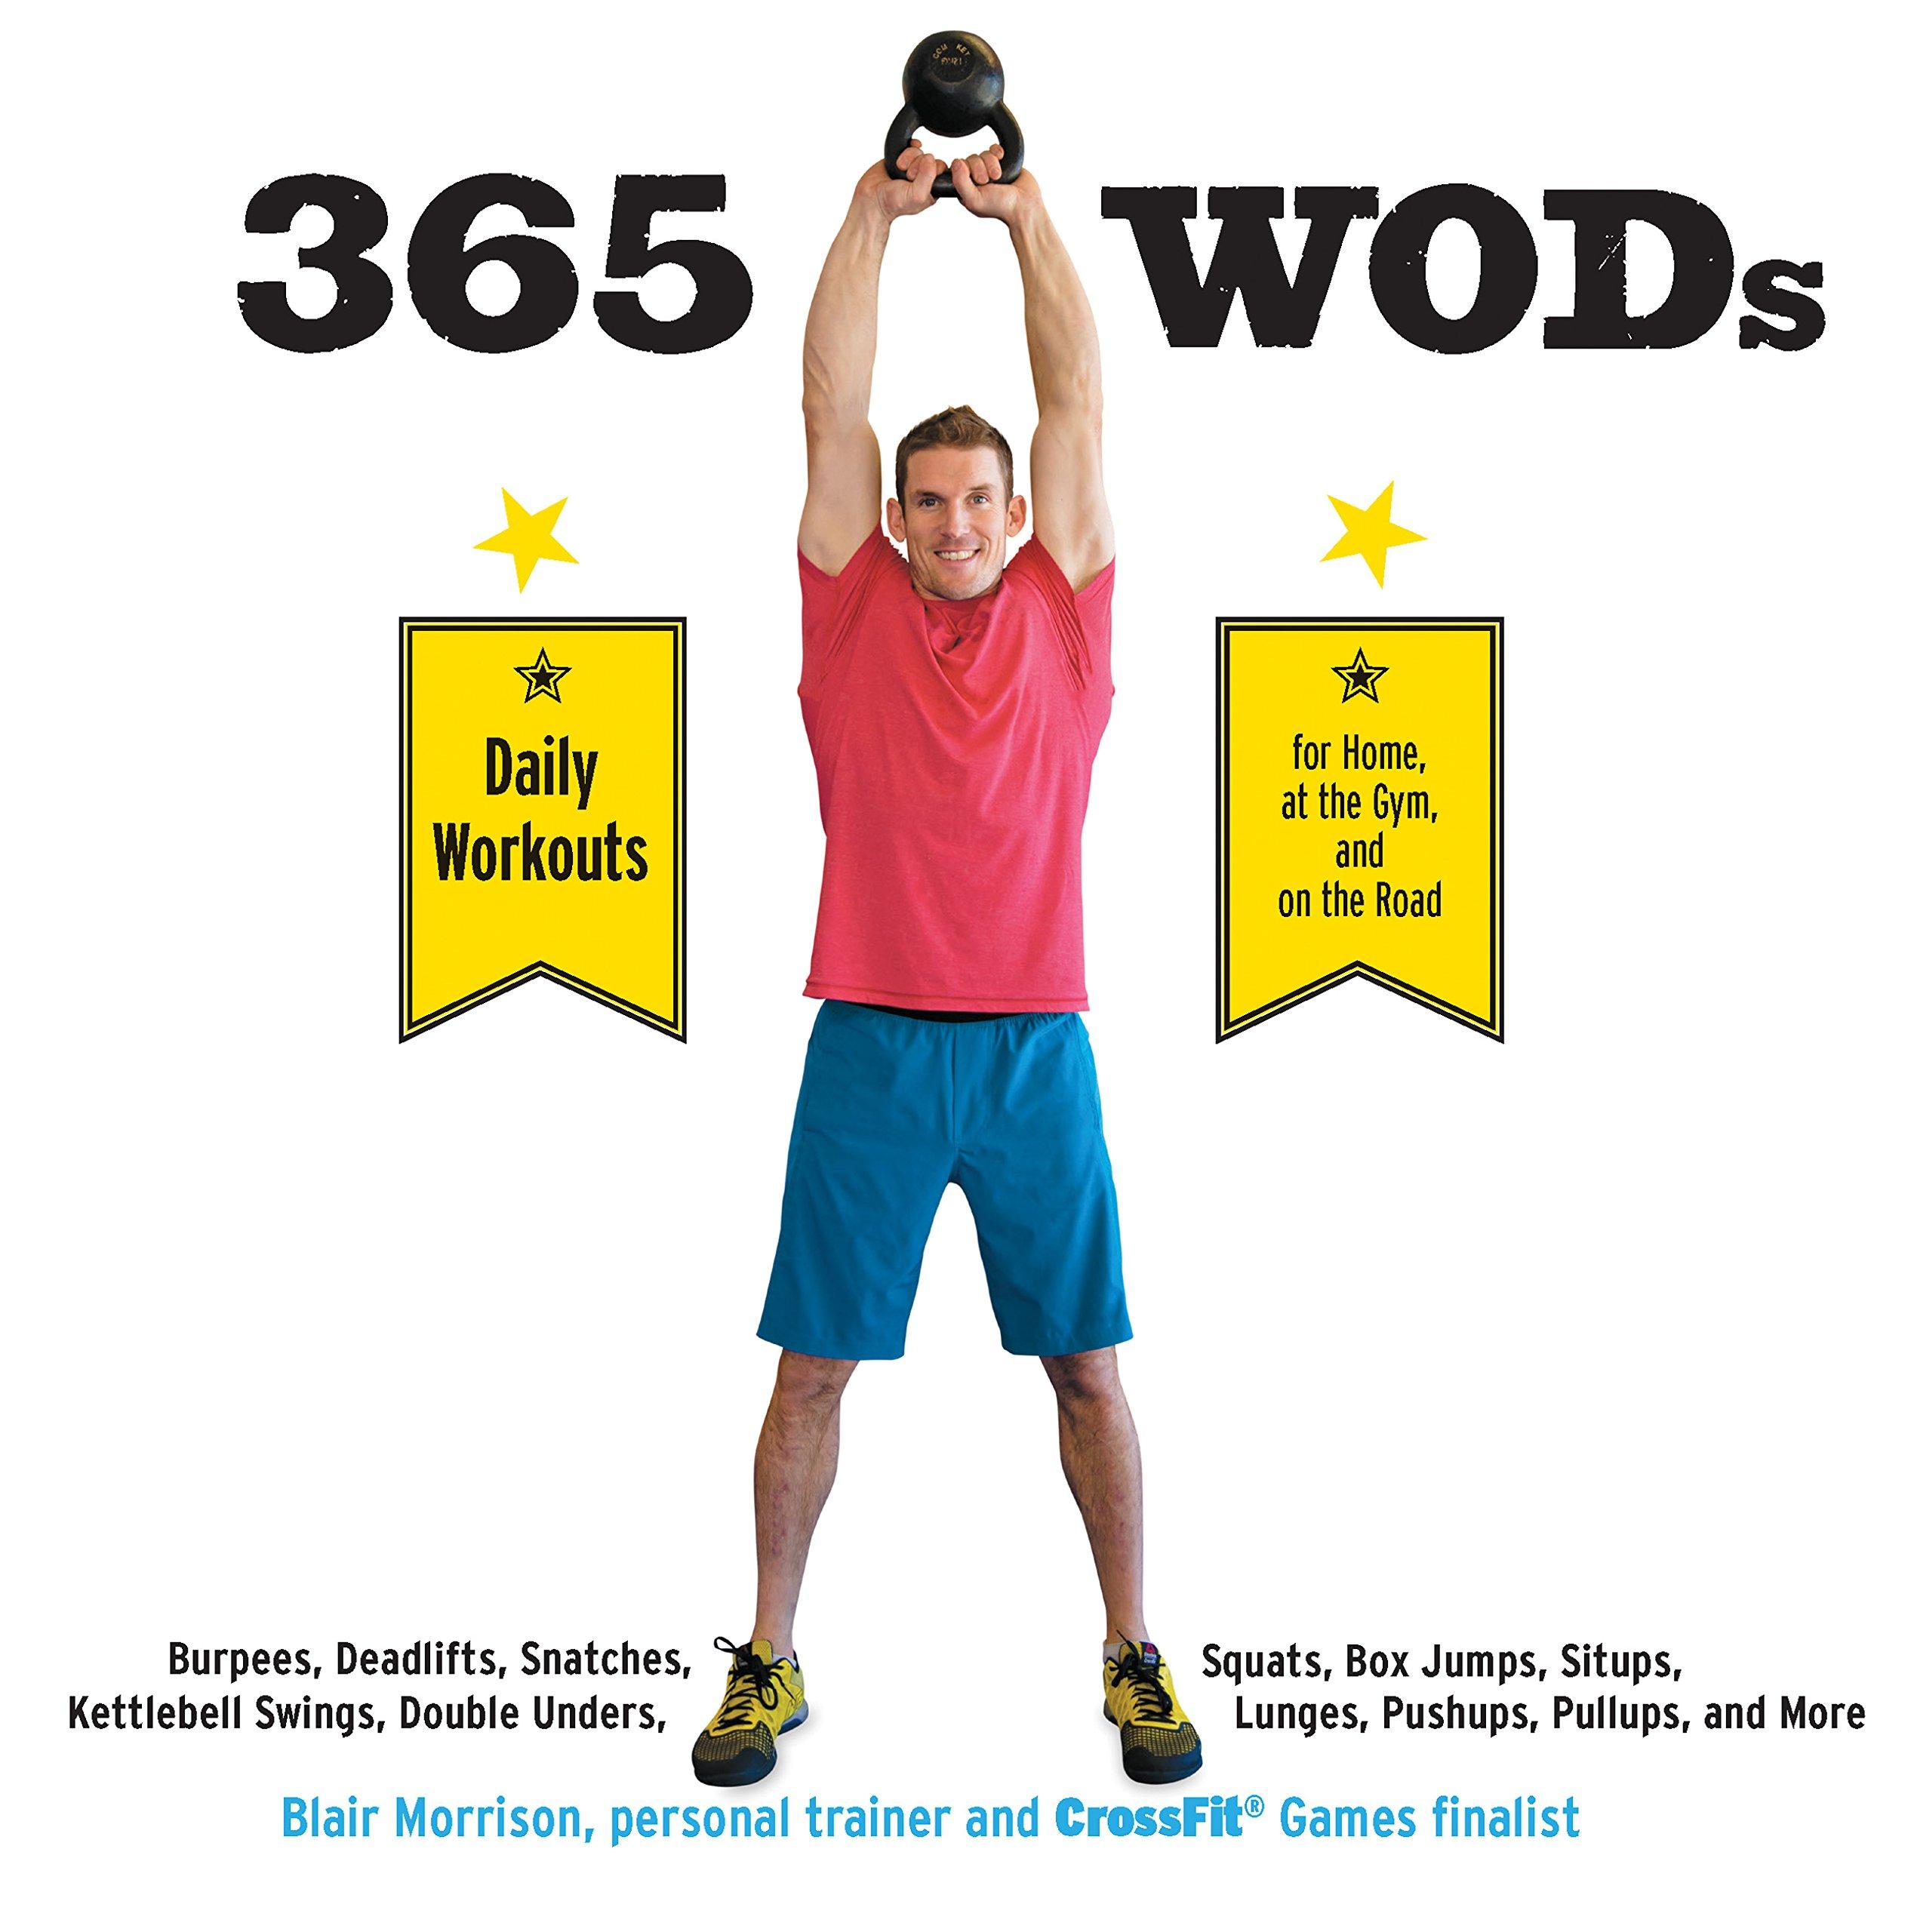 365 WODs: Burpees, Deadlifts, Snatches, Squats, Box Jumps